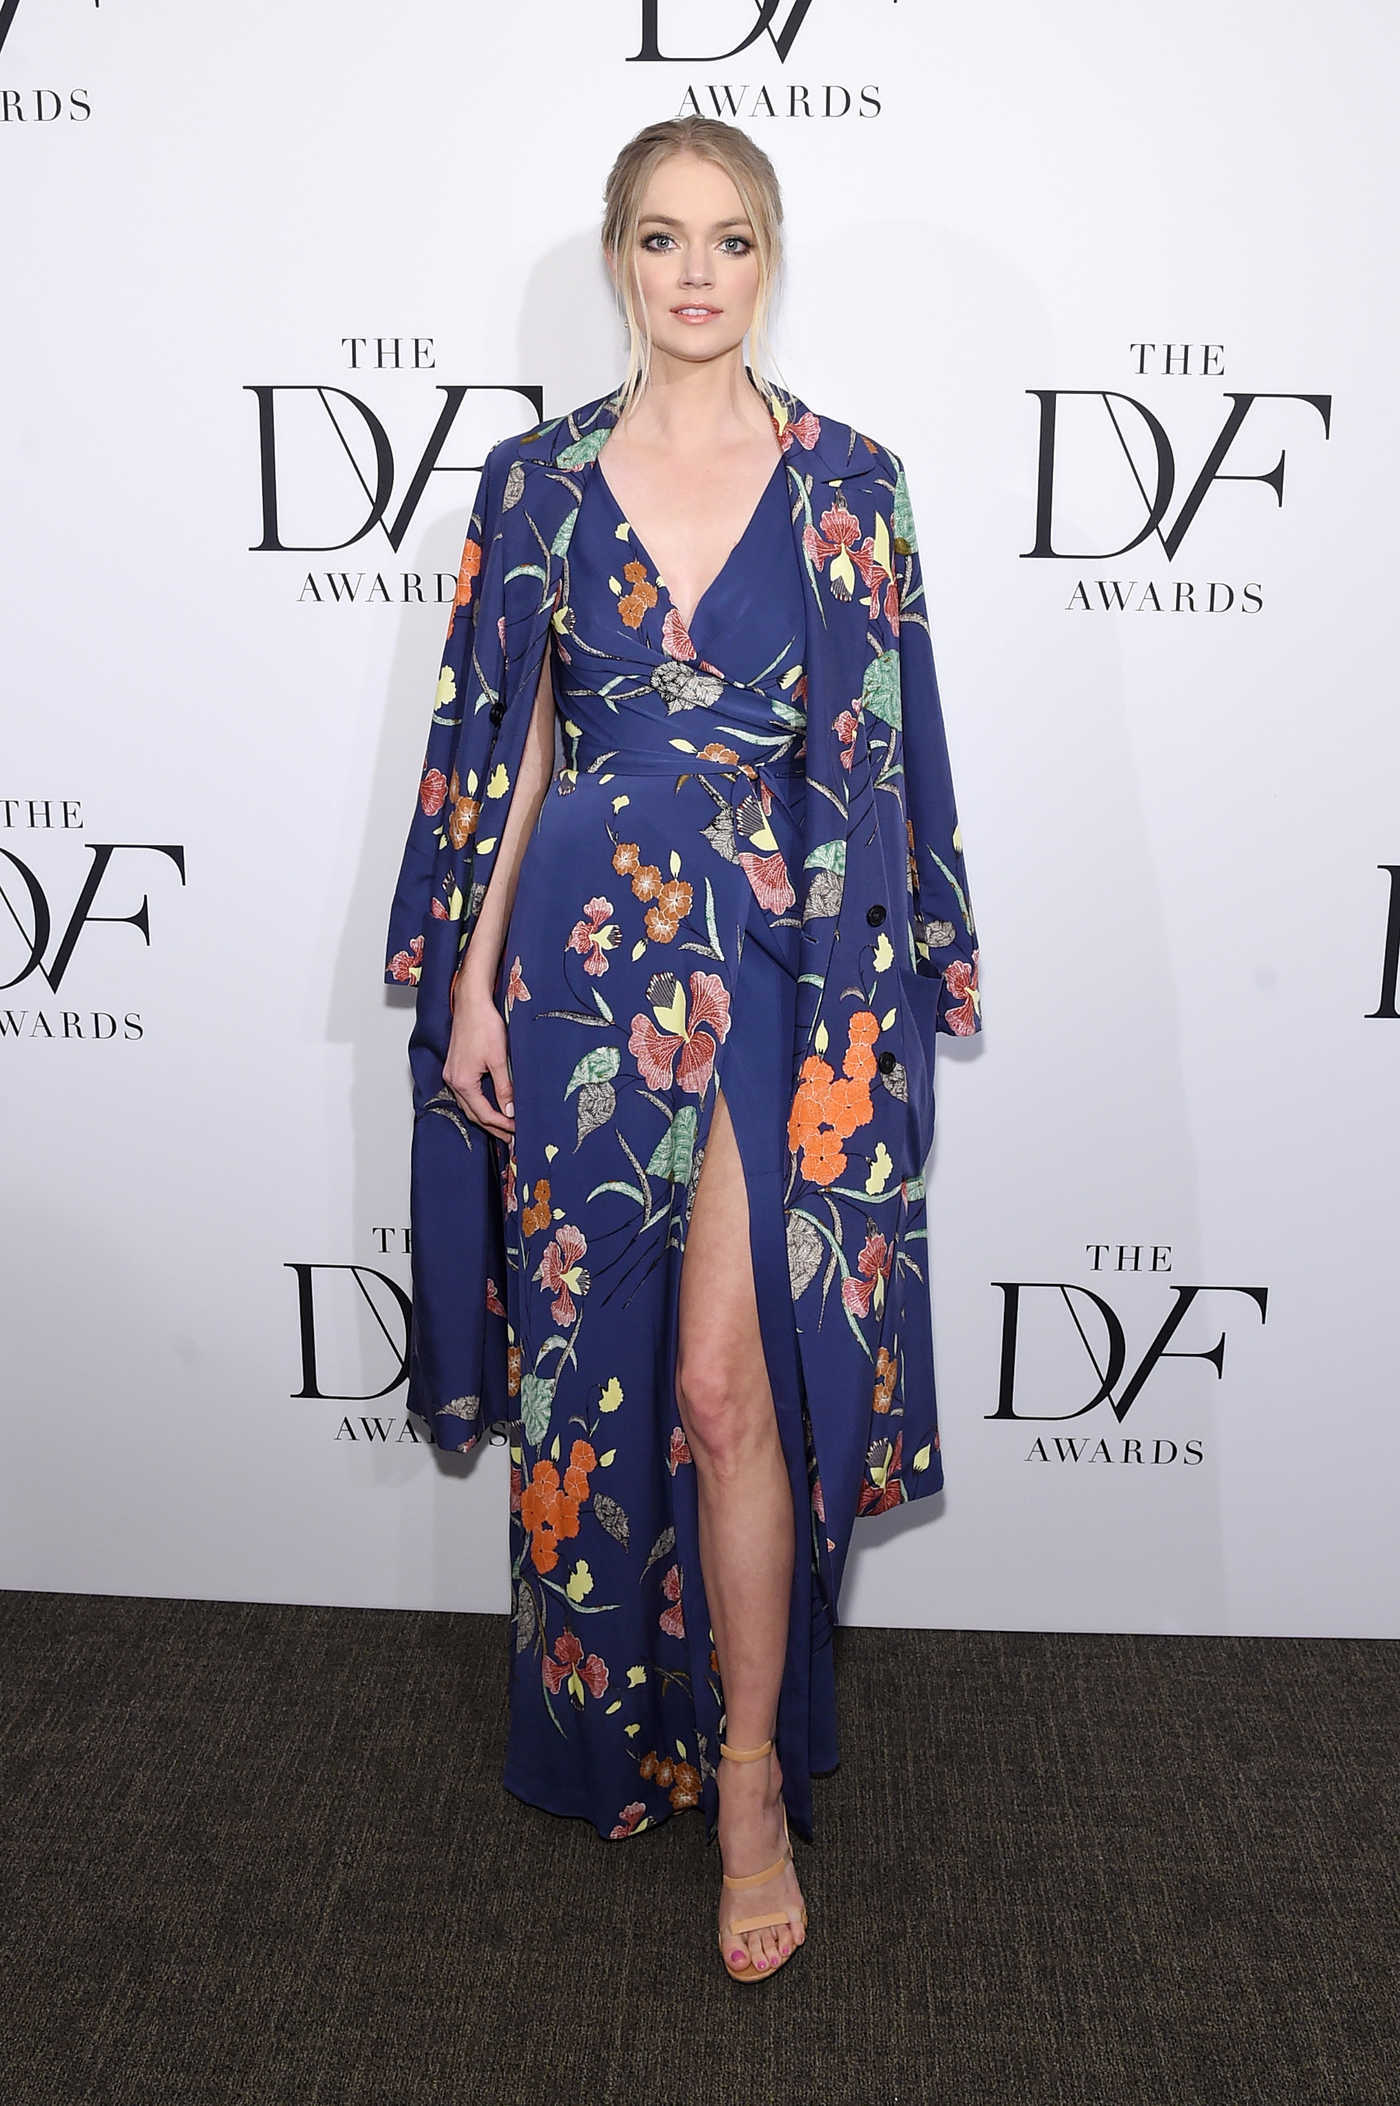 Lindsay Ellingson at the 2017 DVF Awards in New York 04/06/2017